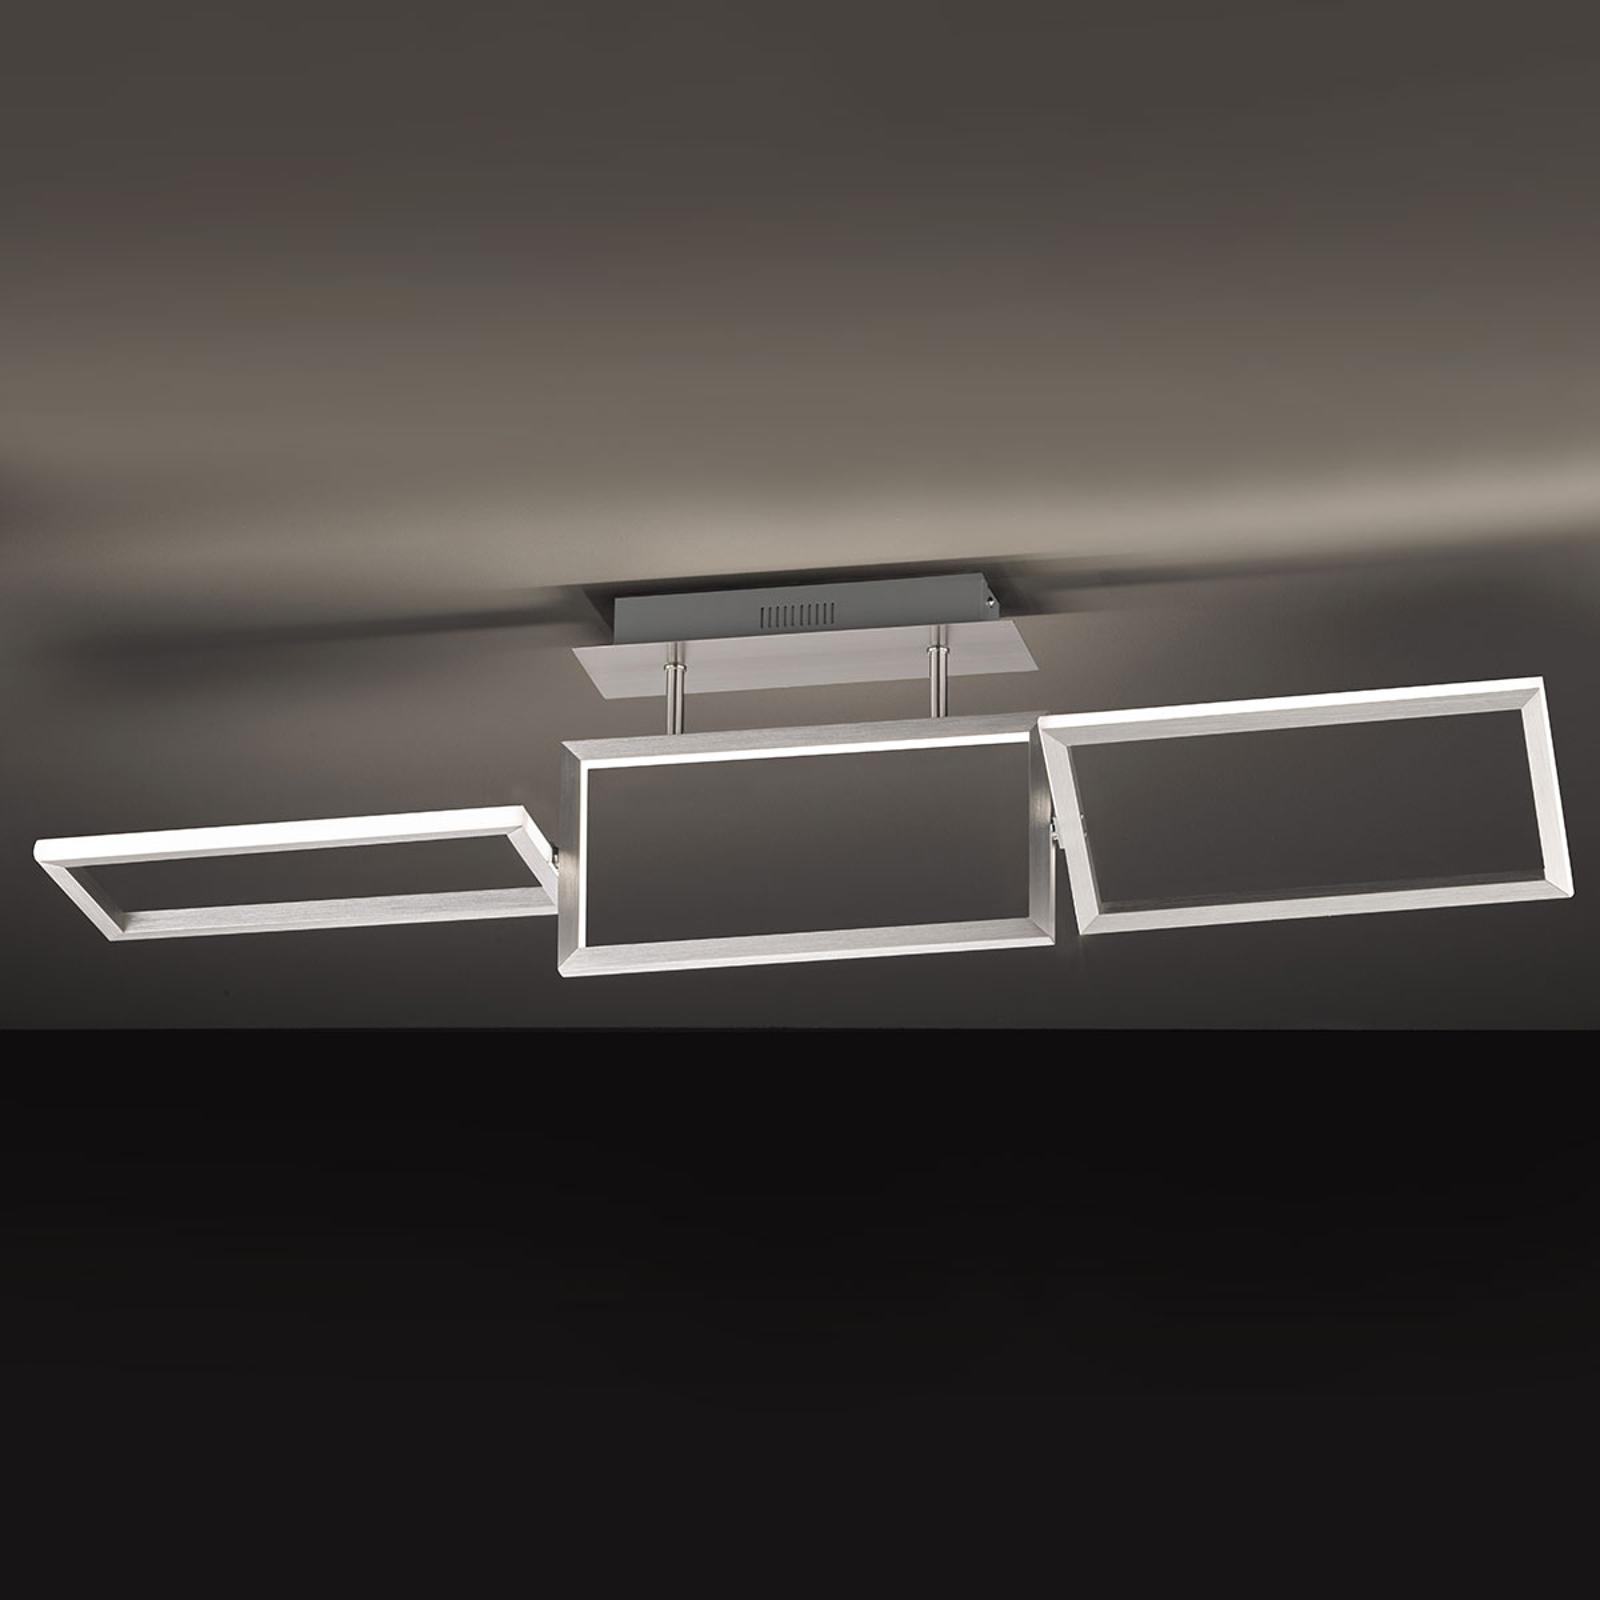 LED-taklampe Skip, justerbar, lengde 101 cm